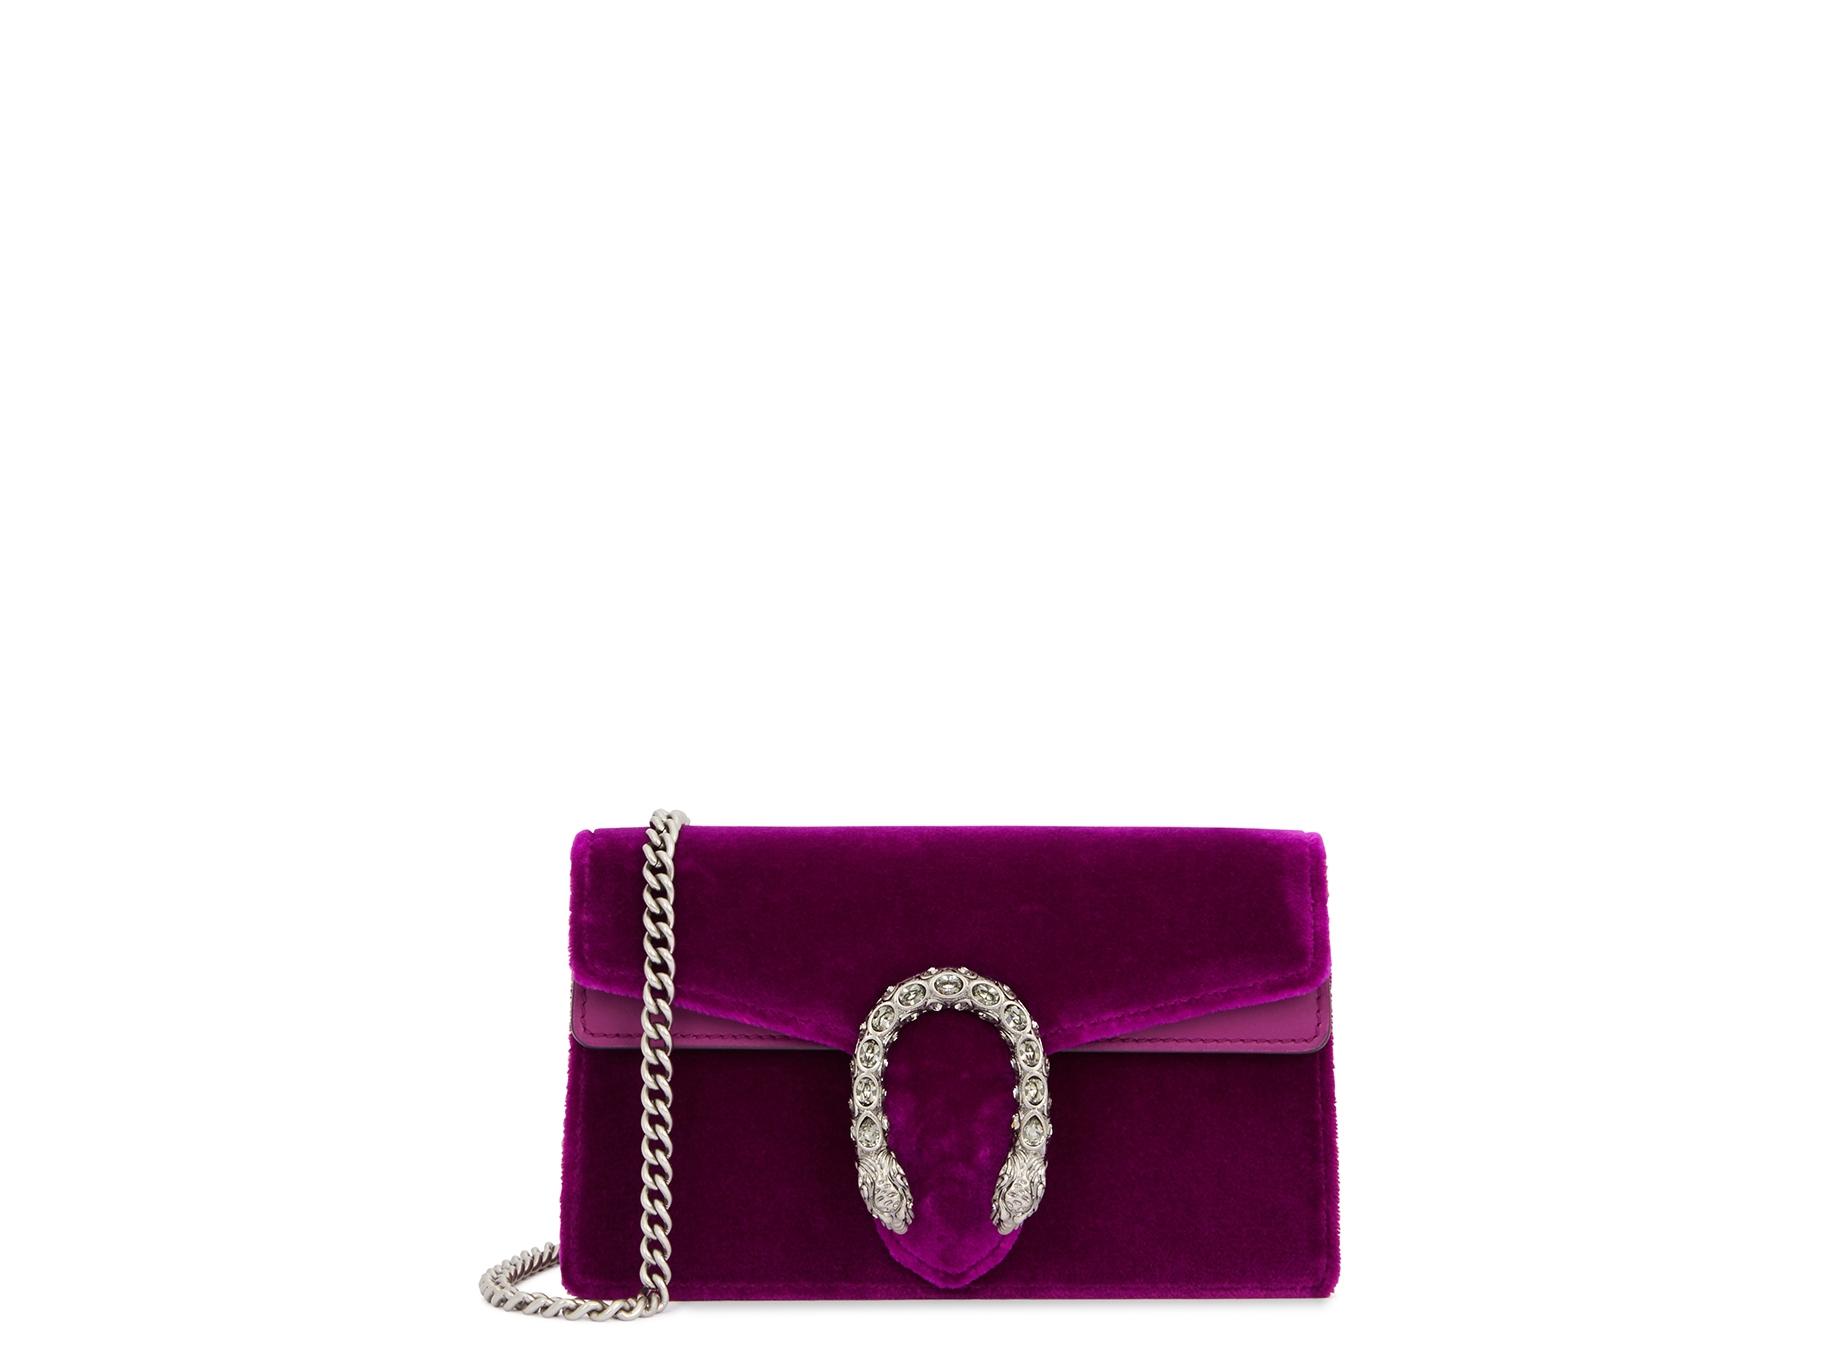 8a304f7fd982 Gucci Dionysus super mini velvet clutch - Harvey Nichols